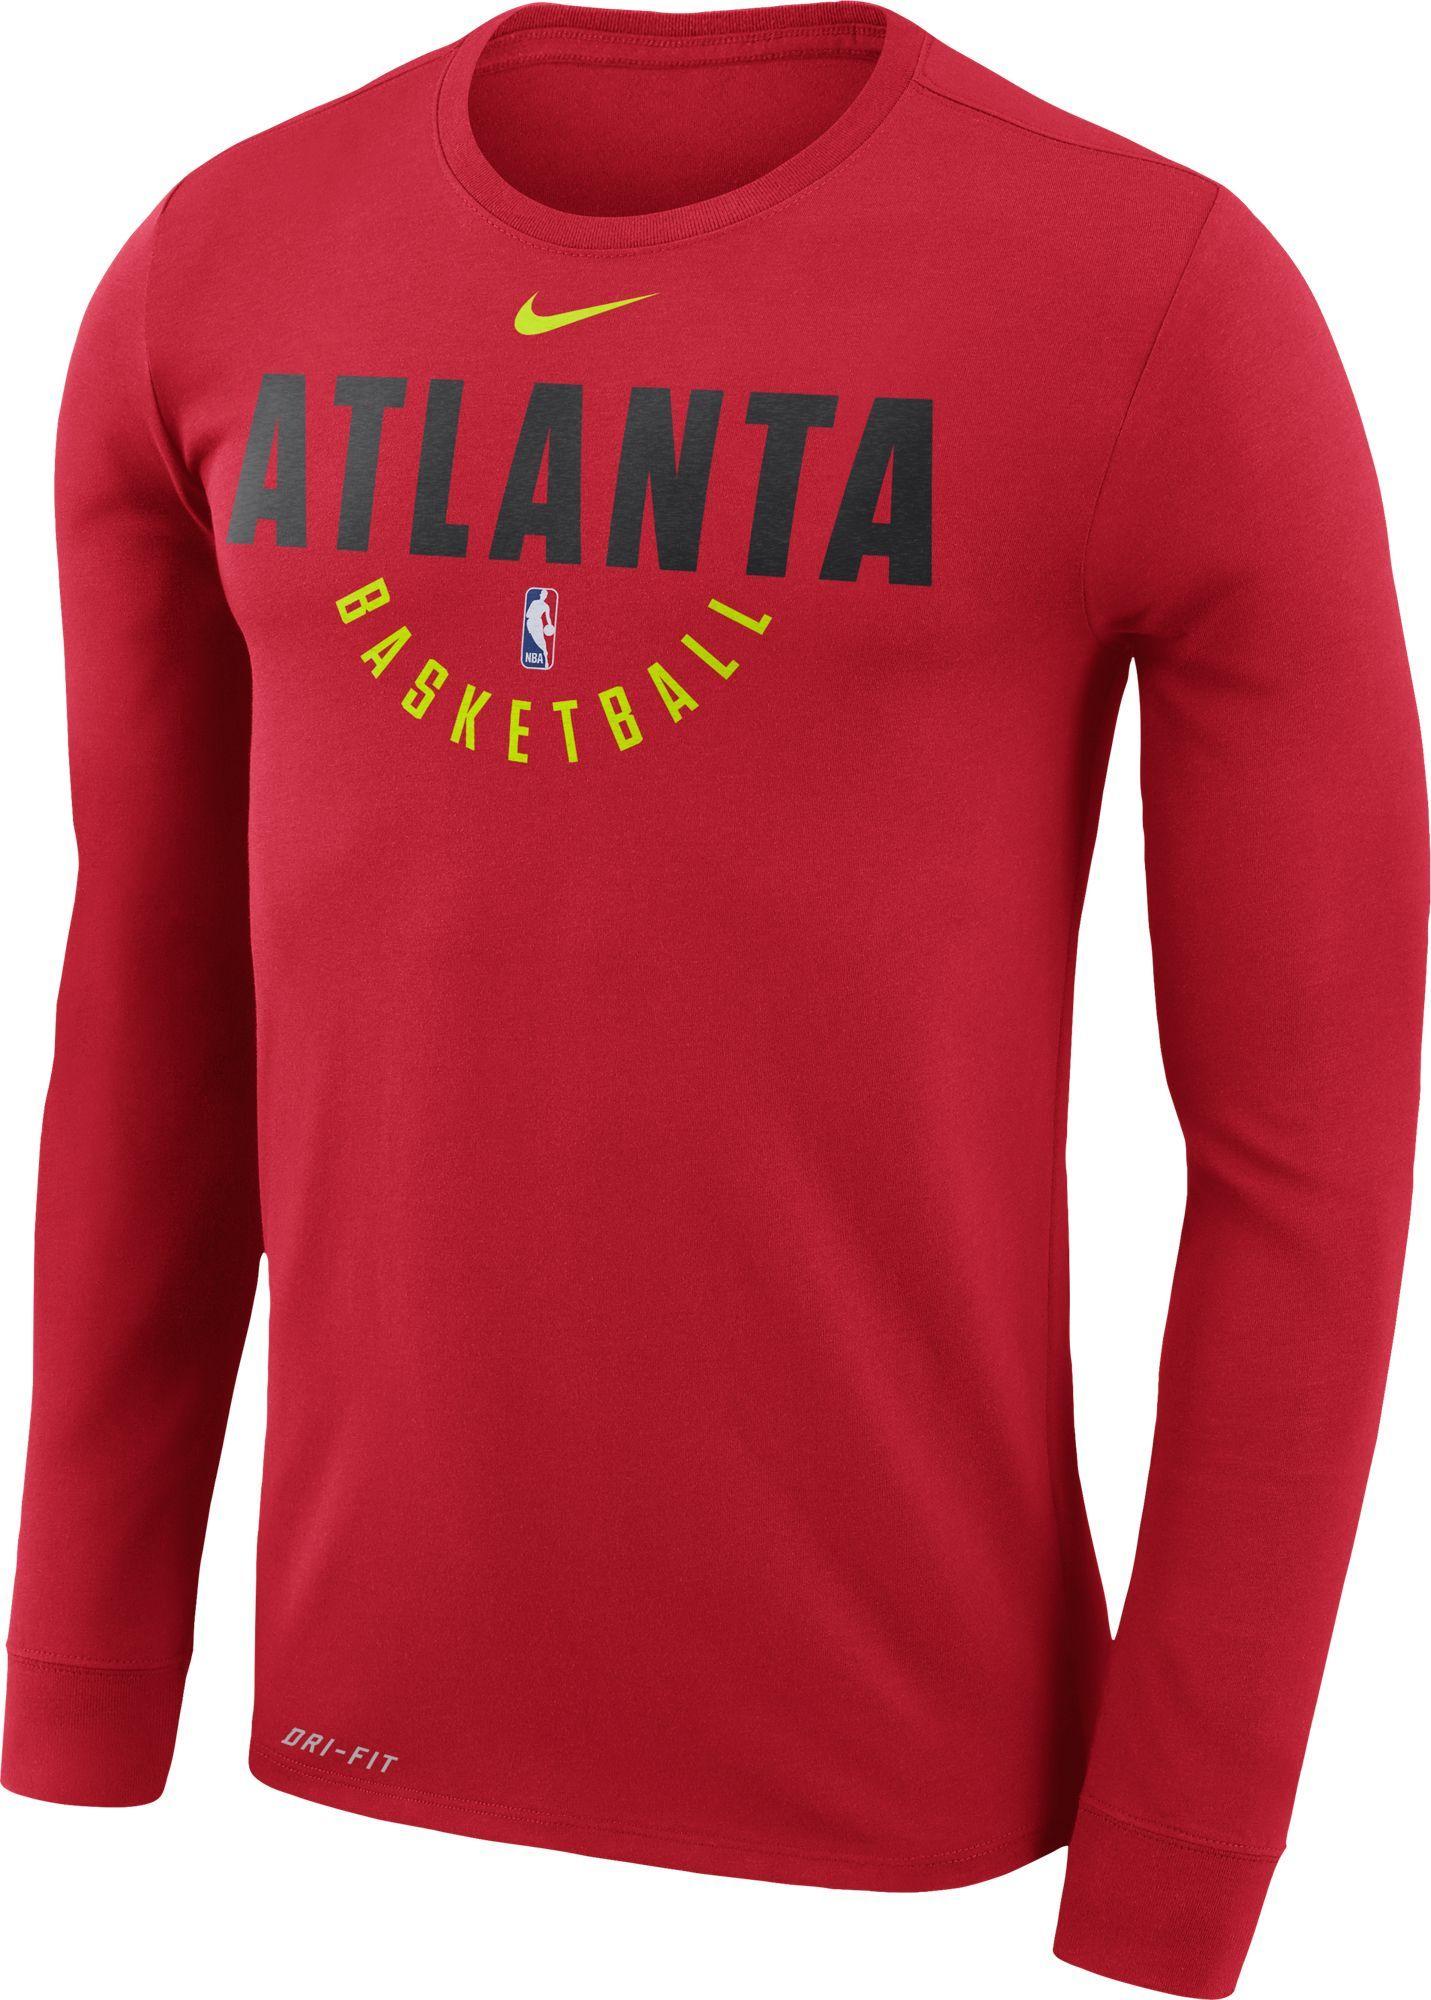 6f31c670f07 Nike Men s Atlanta Hawks Dri-FIT Red Practice Long Sleeve Shirt ...